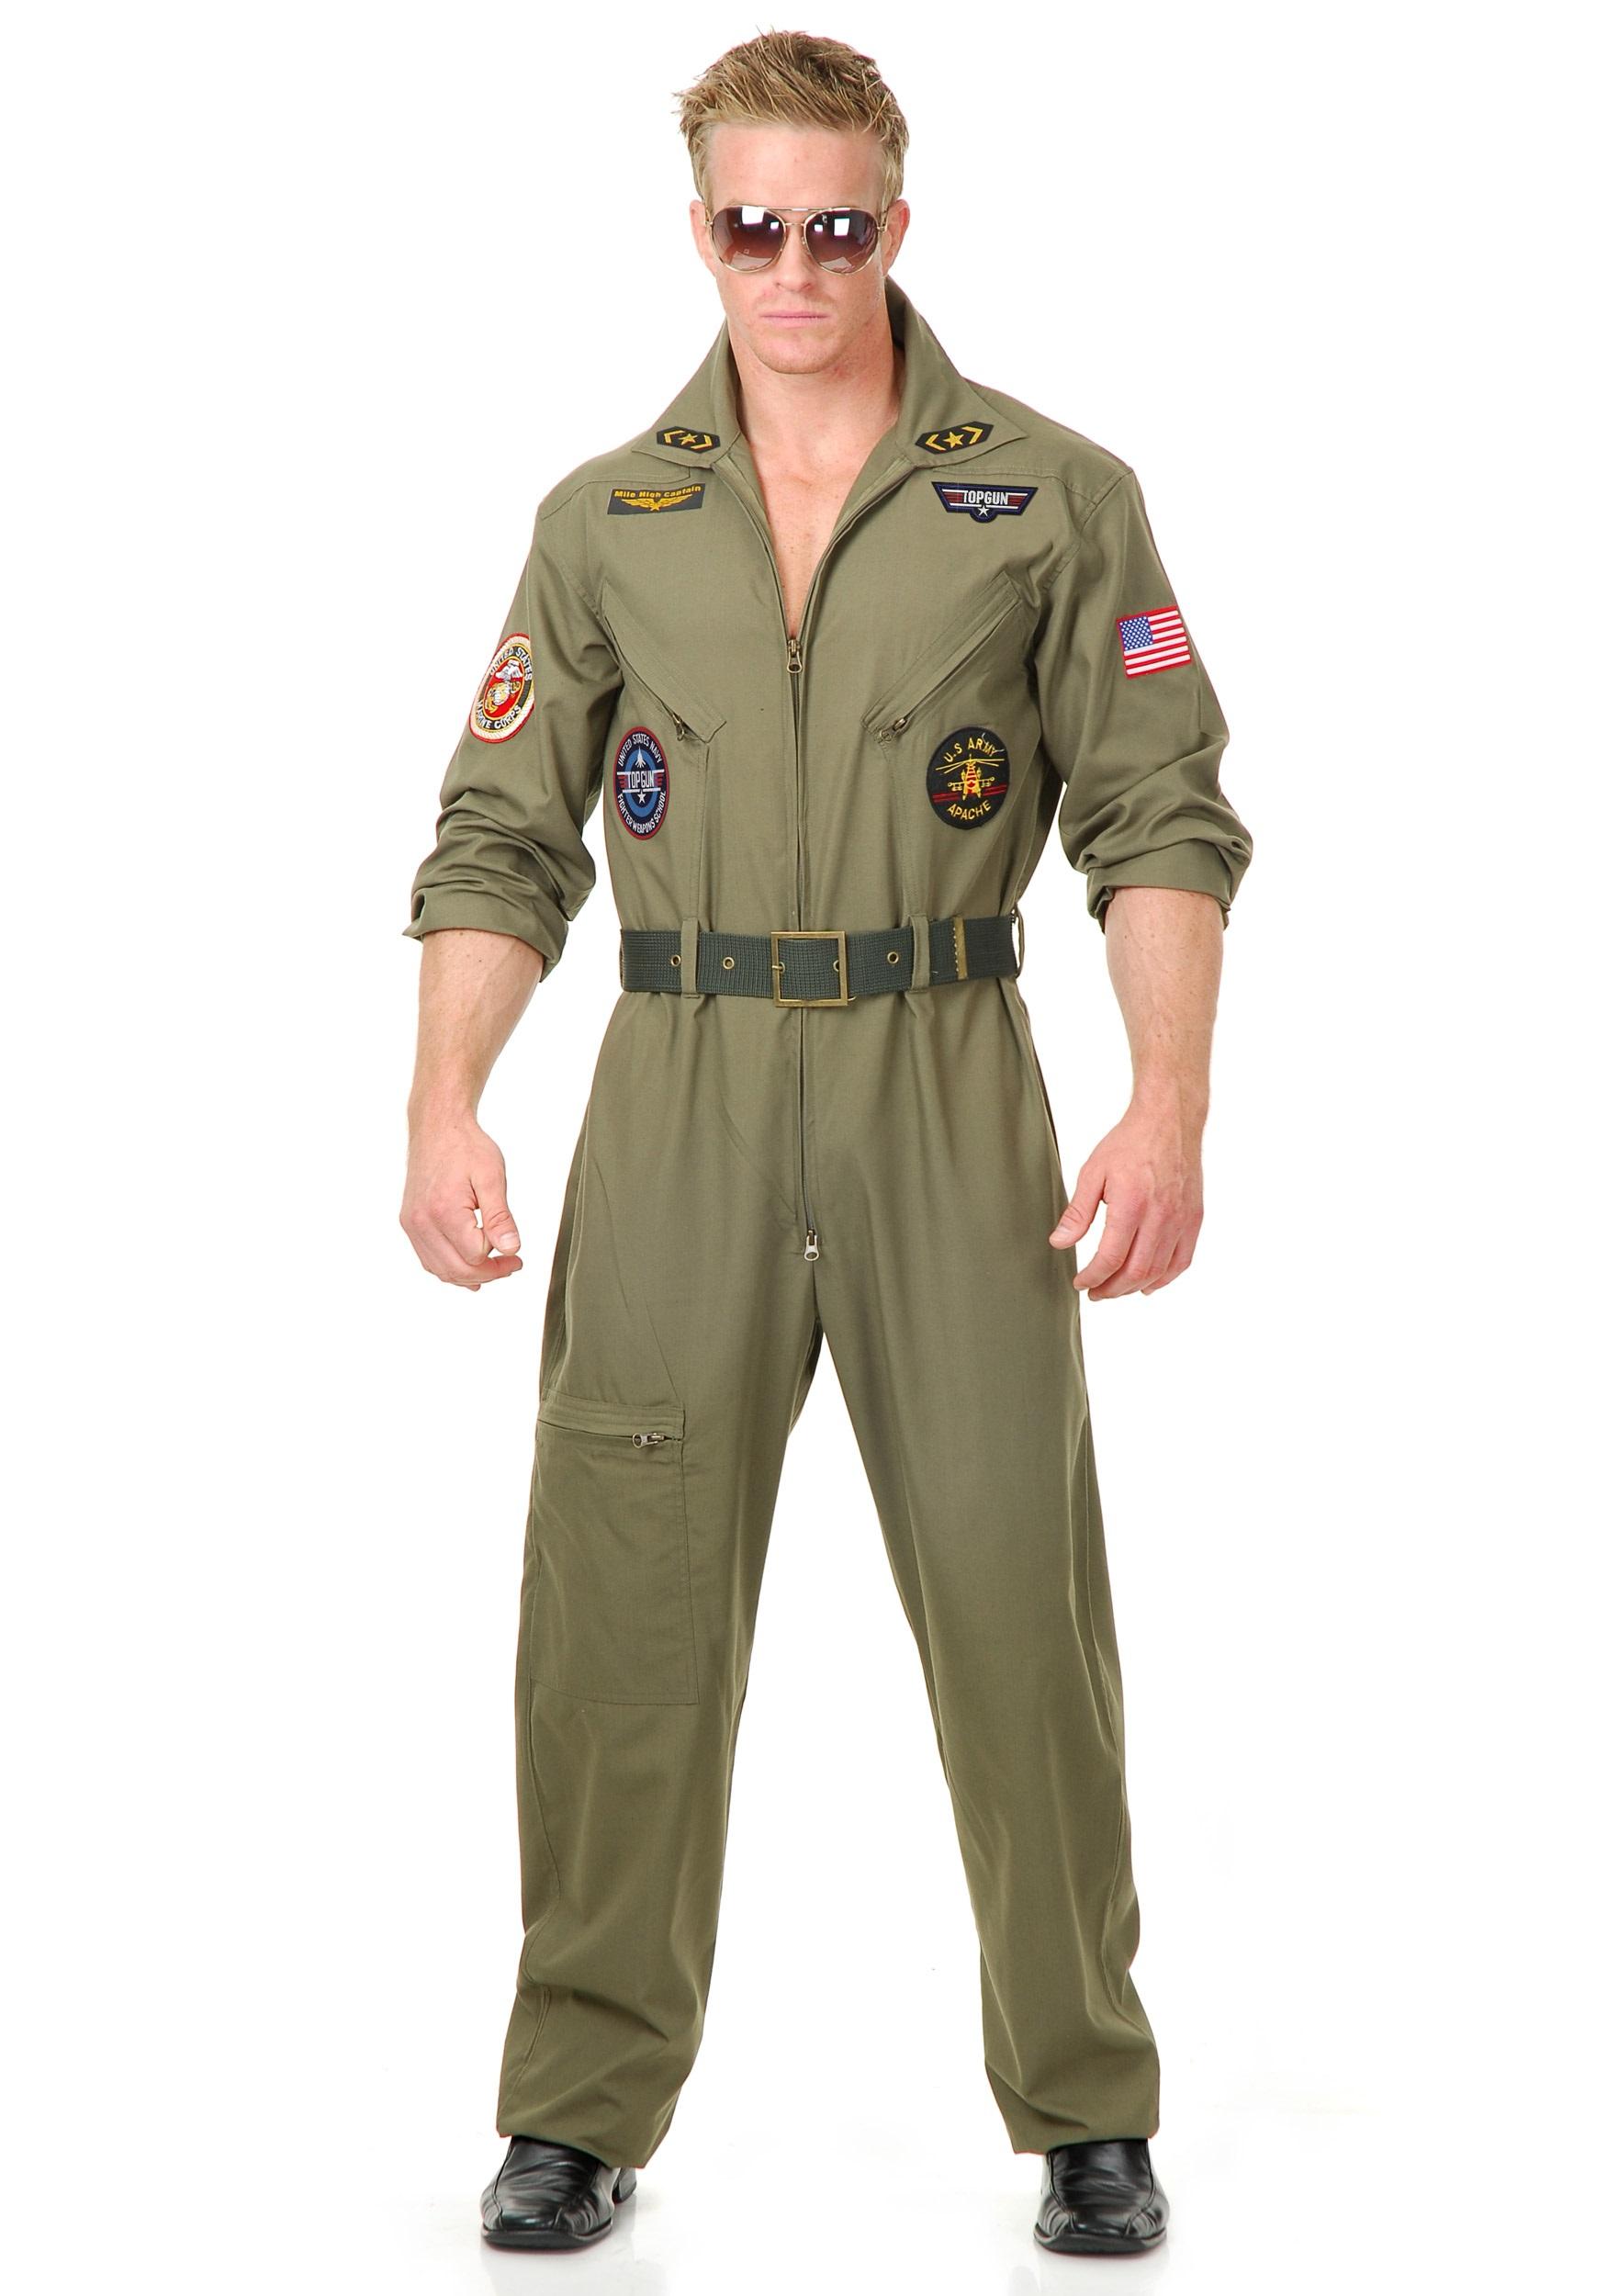 Just Plus size uniform from mukhort